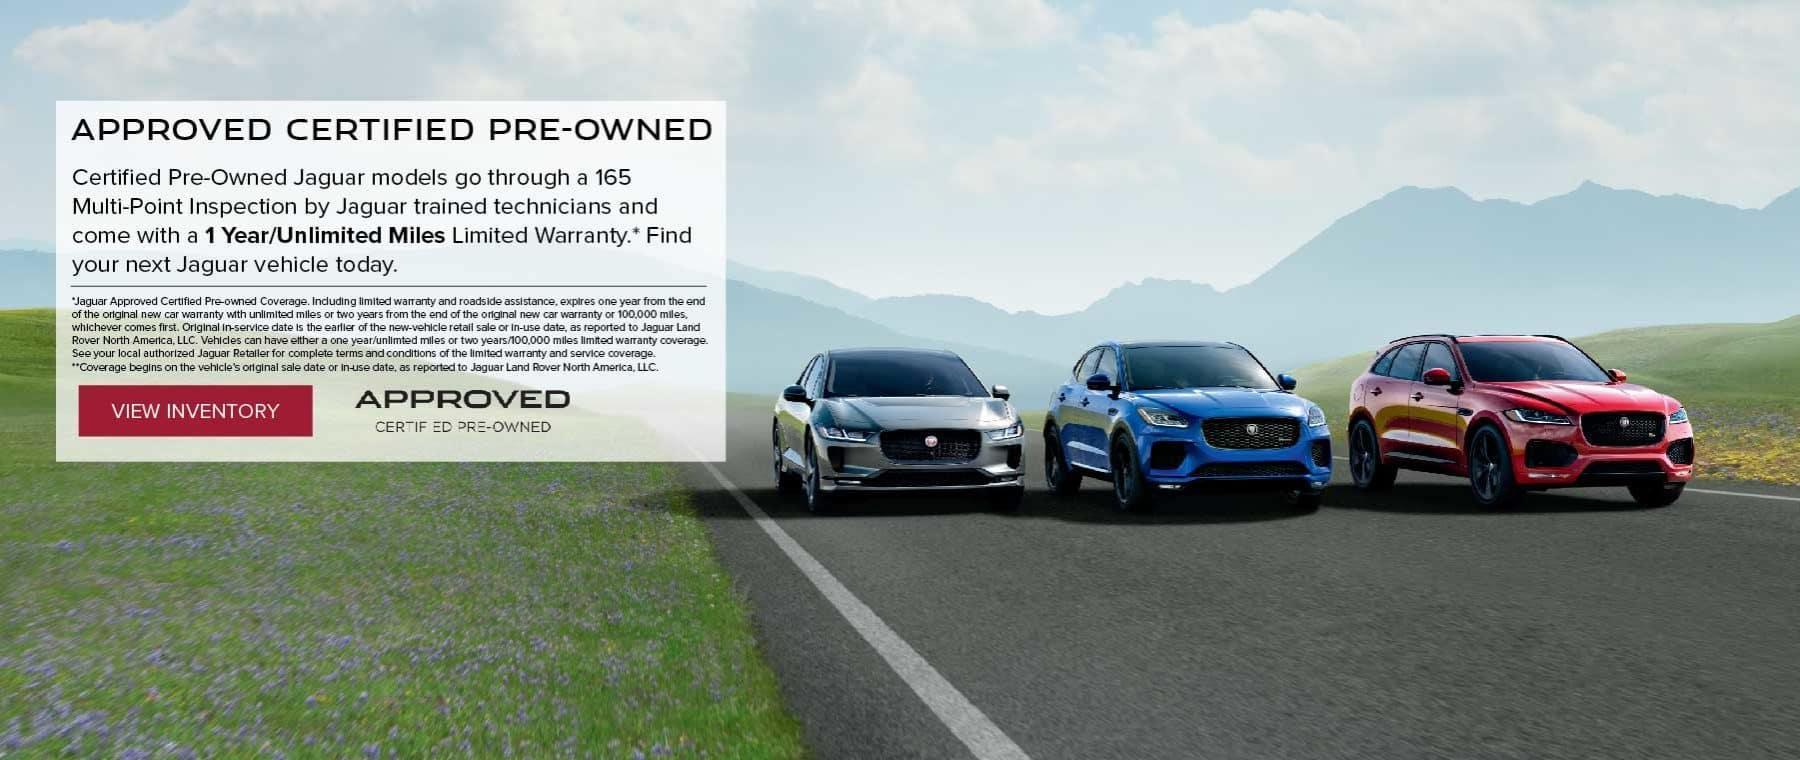 Jaguar Gulf Coast_Approved CPO